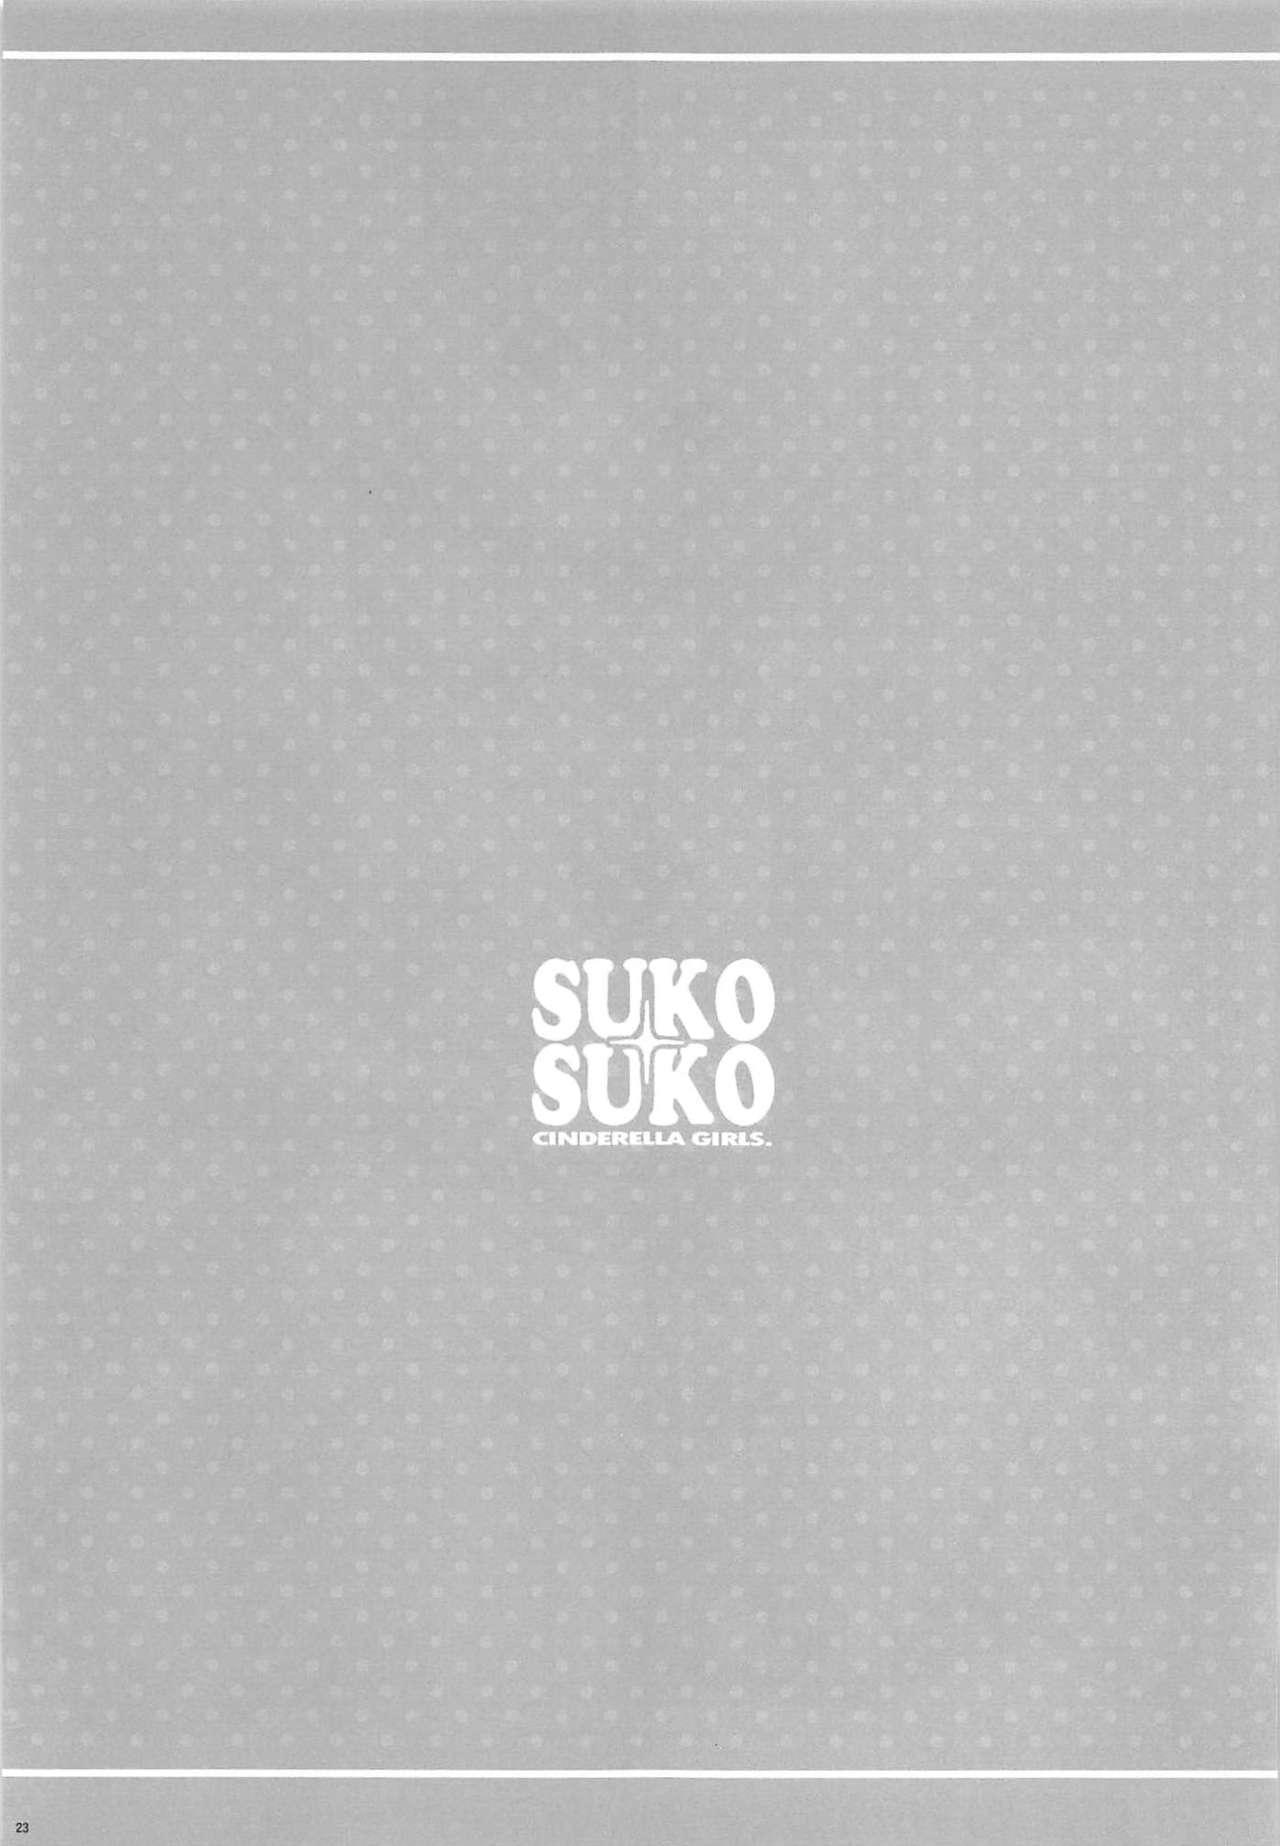 SUKO + SUKO 22